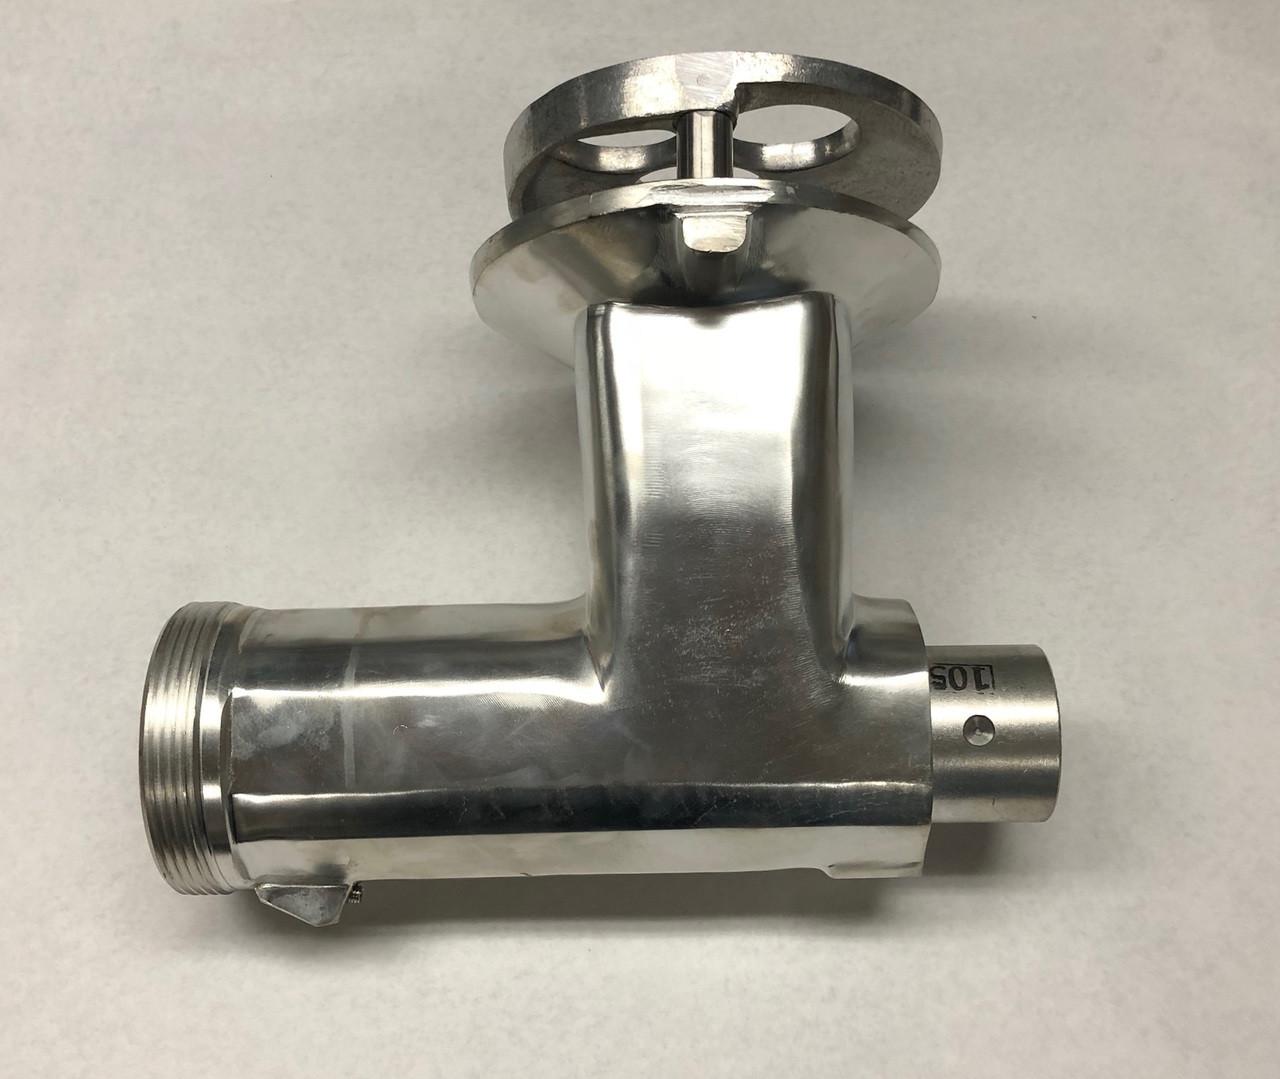 TorRey M32 Series HeadStock - 05-72588